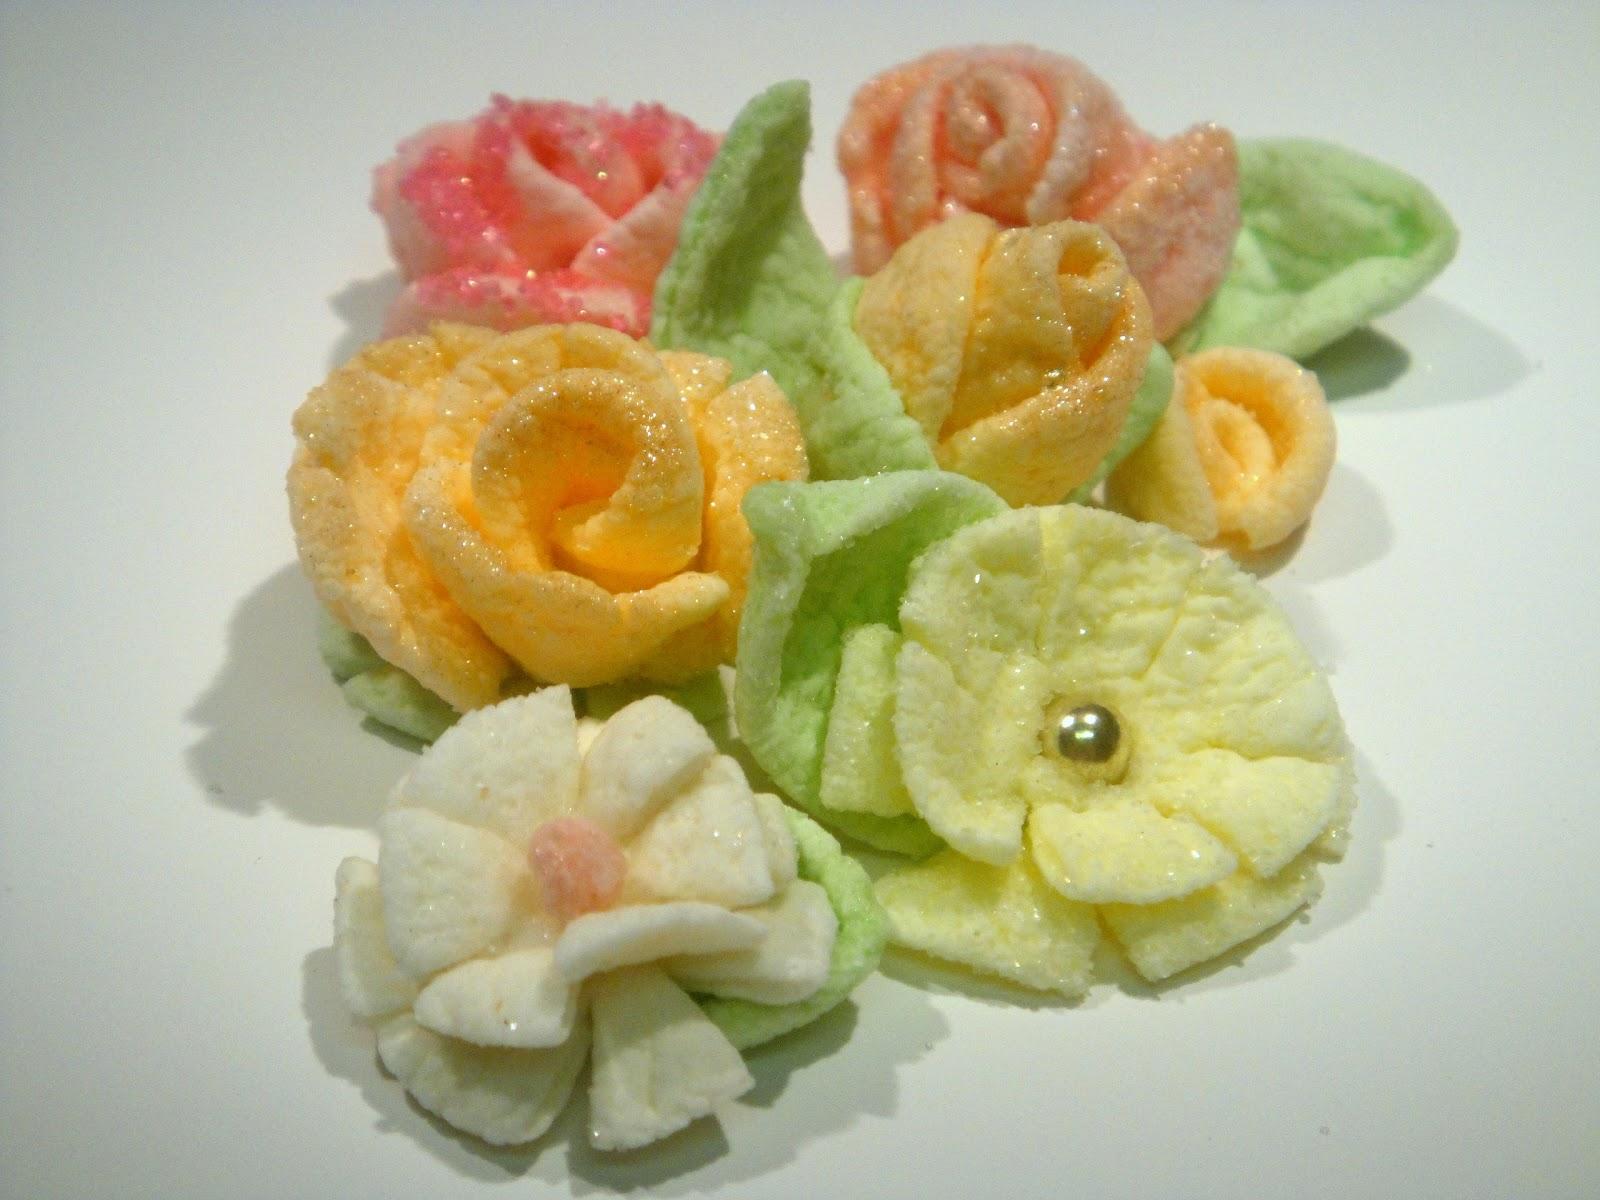 Cake Decorating Marshmallow Flowers : ~ Sugar Teachers ~ Cake Decorating and Sugar Art Tutorials ...